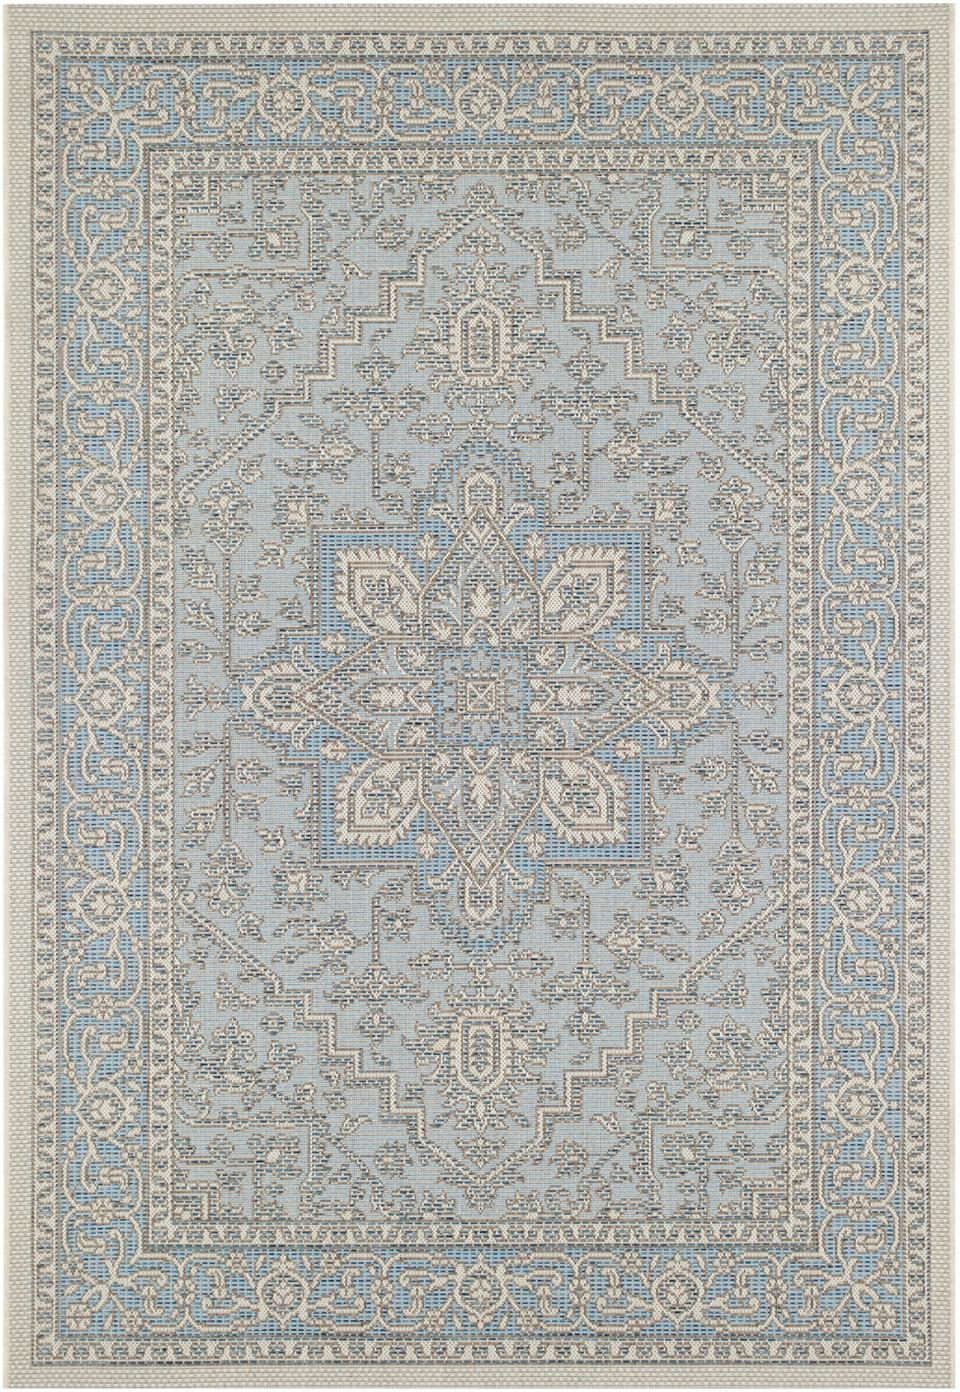 In- & outdoor vloerkleed Anjara, Polypropyleen, Azuurblauw, taupe, B 200 x L 290 cm (maat L)